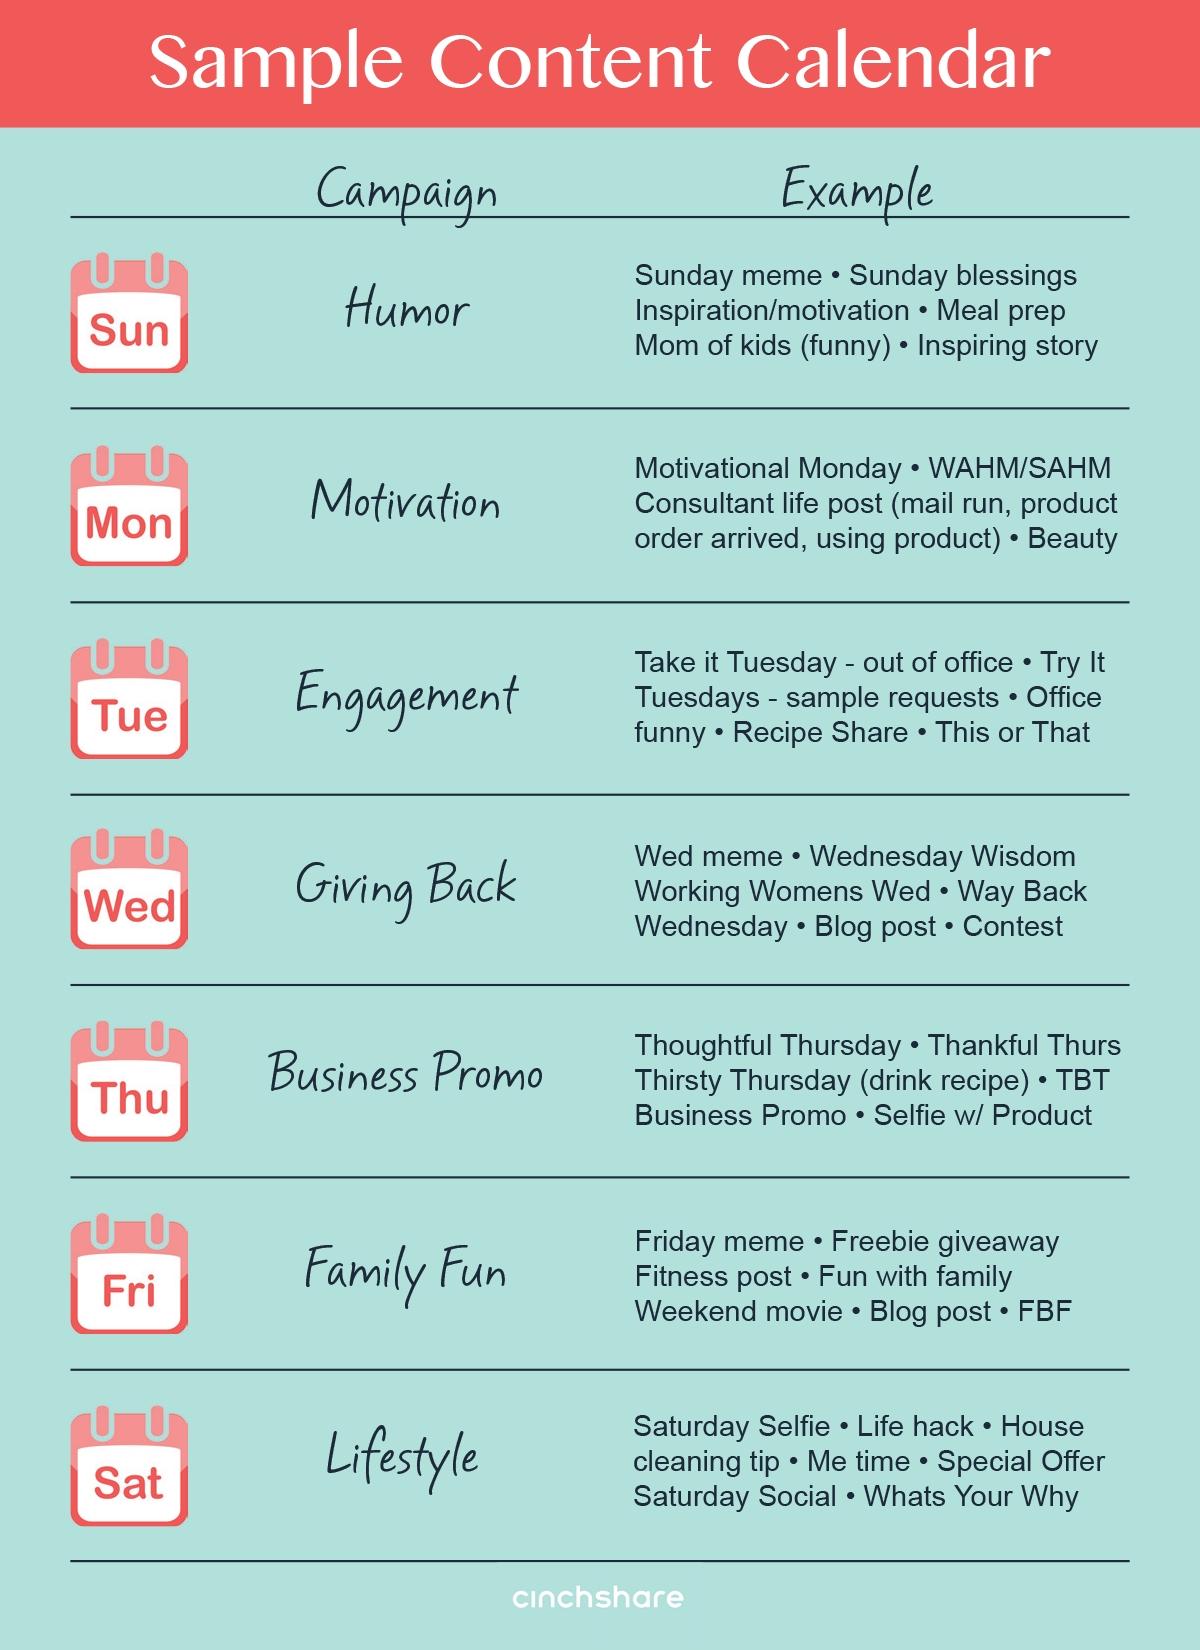 What Is Social Media? | Digital Marketing | Social Media Marketing with Social Media Content Weekly Schedule